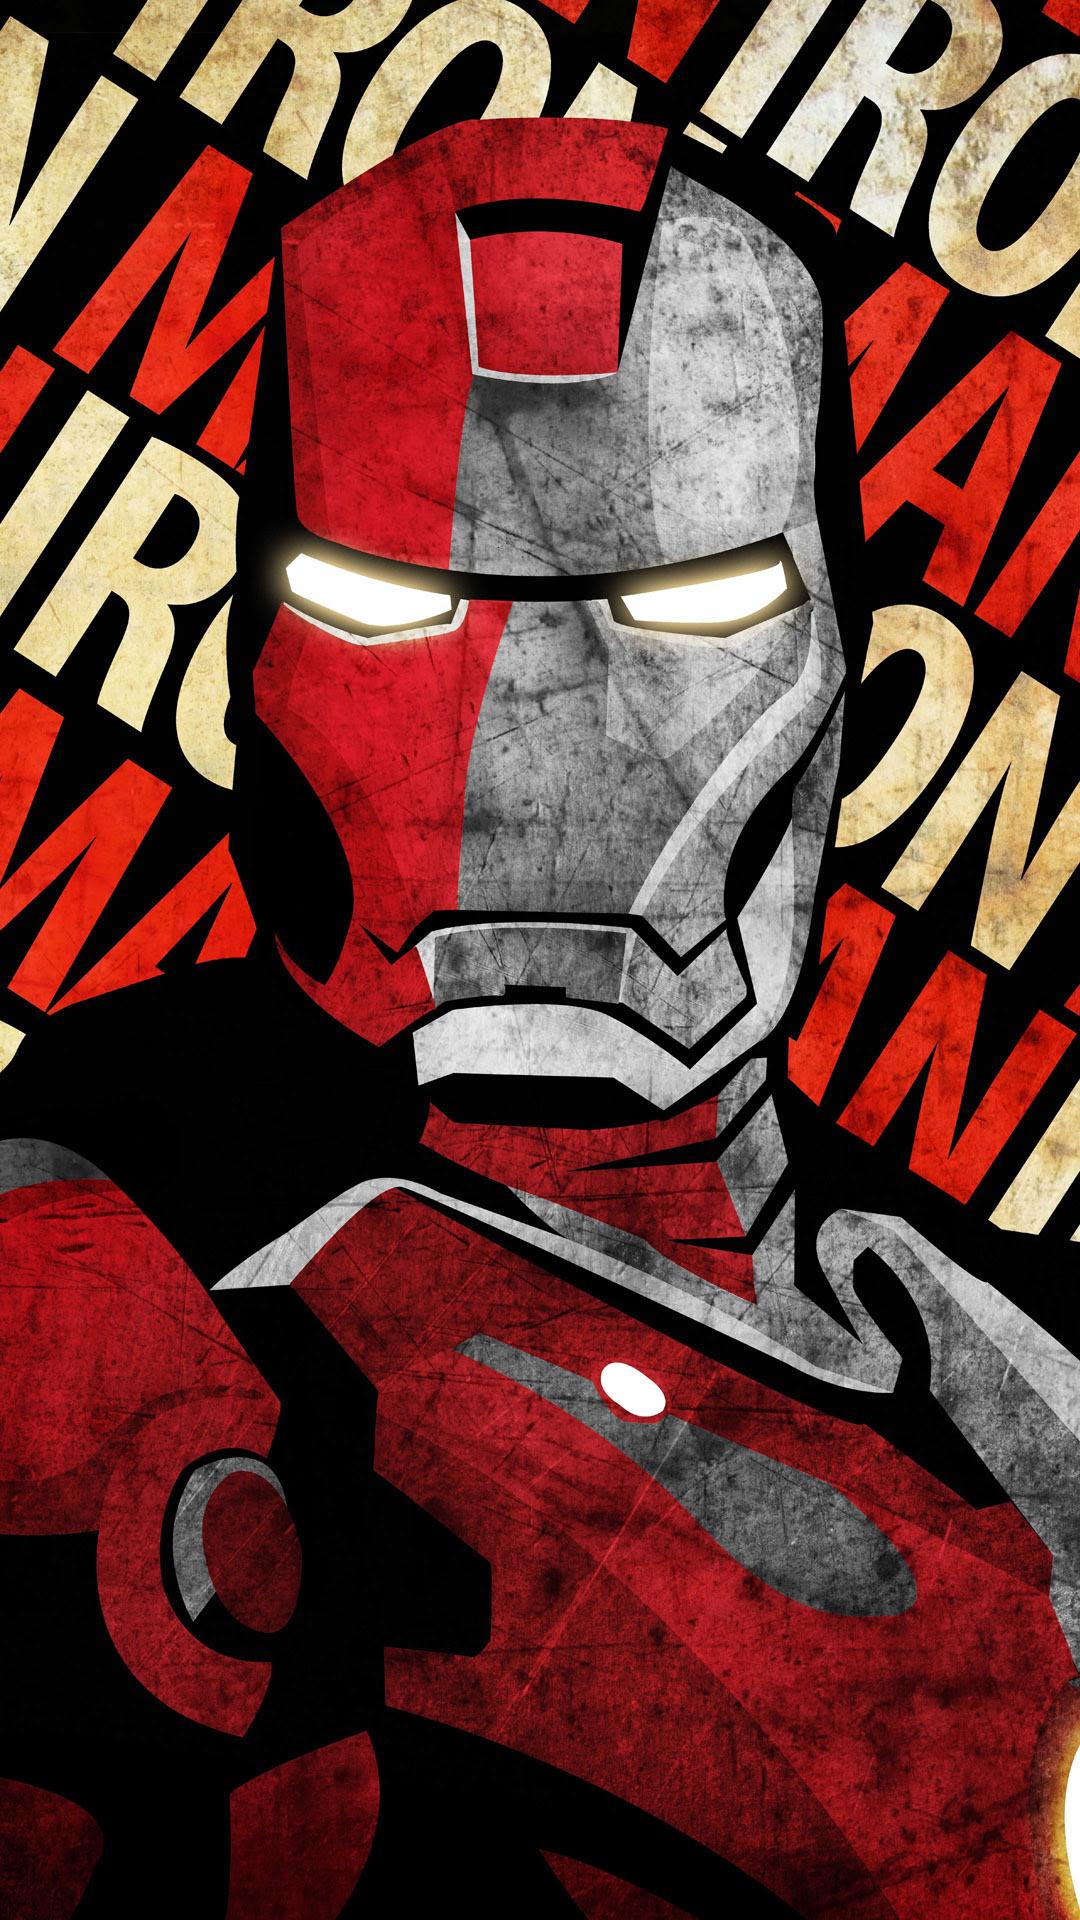 Download Iron Man Eyes Wallpaper Hd Cikimmcom